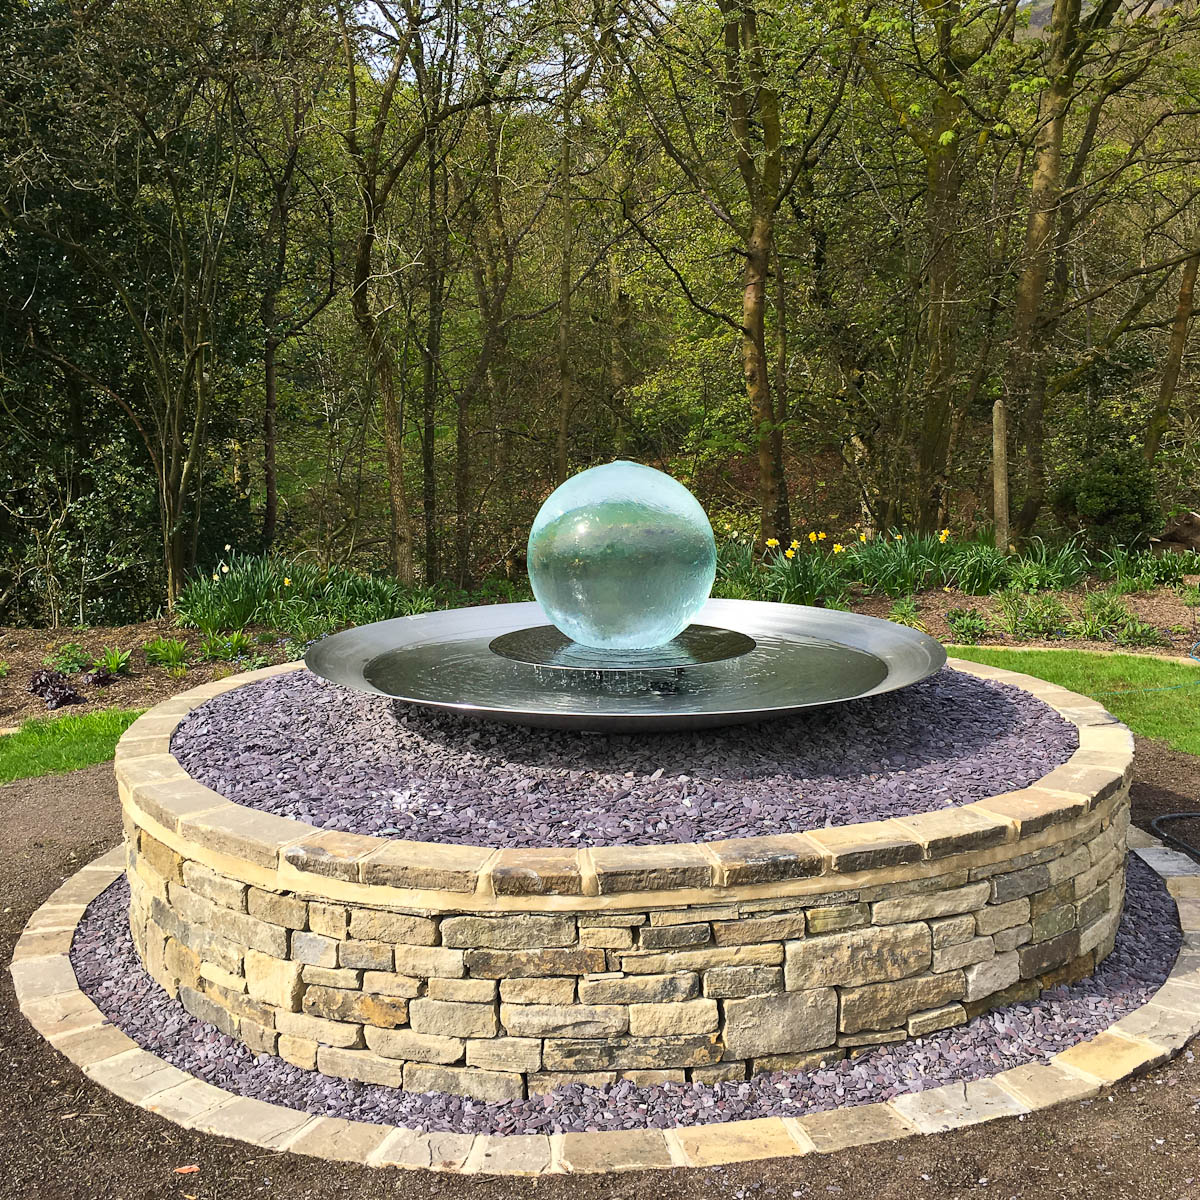 Garden Landscaping In Halifax Huddersfield West: Aqualens In Shibden, West Yorkshire